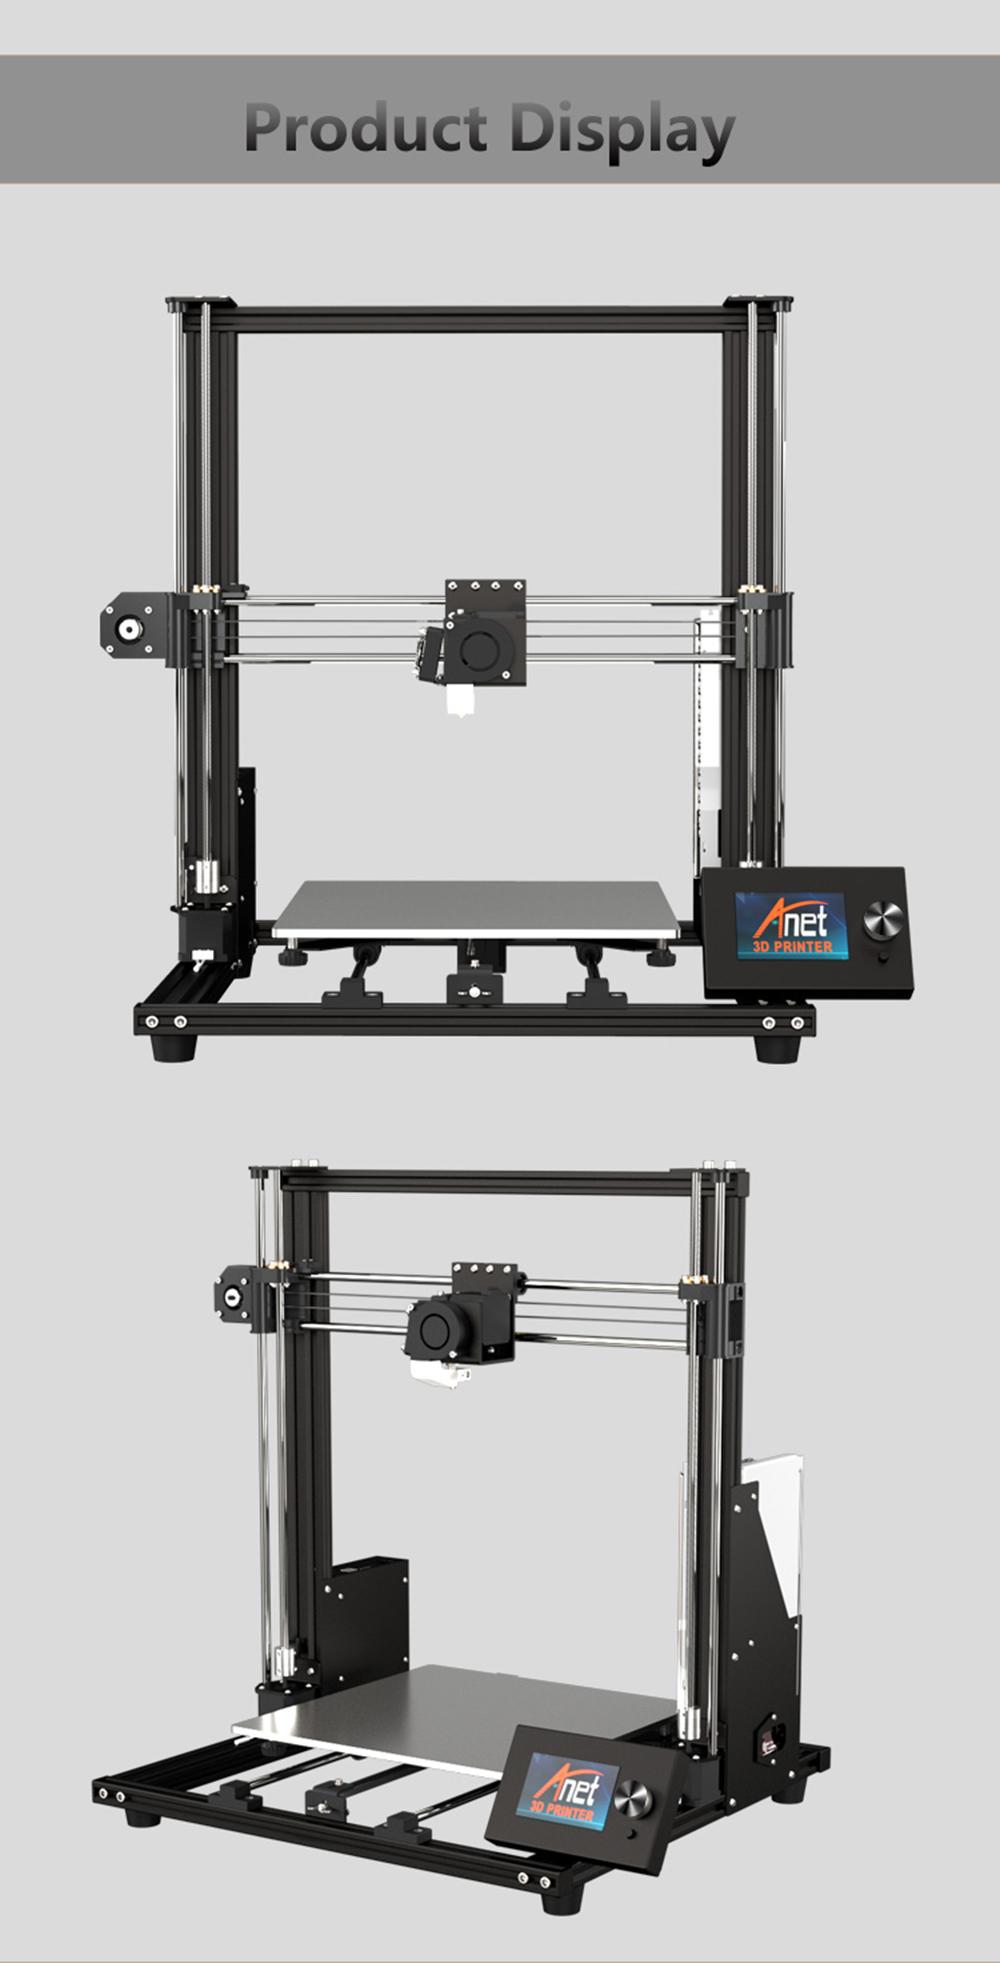 Anet A8 Plus 3D-Drucker Bausatz - 300x300x350mm - Verschiedene Ansichten